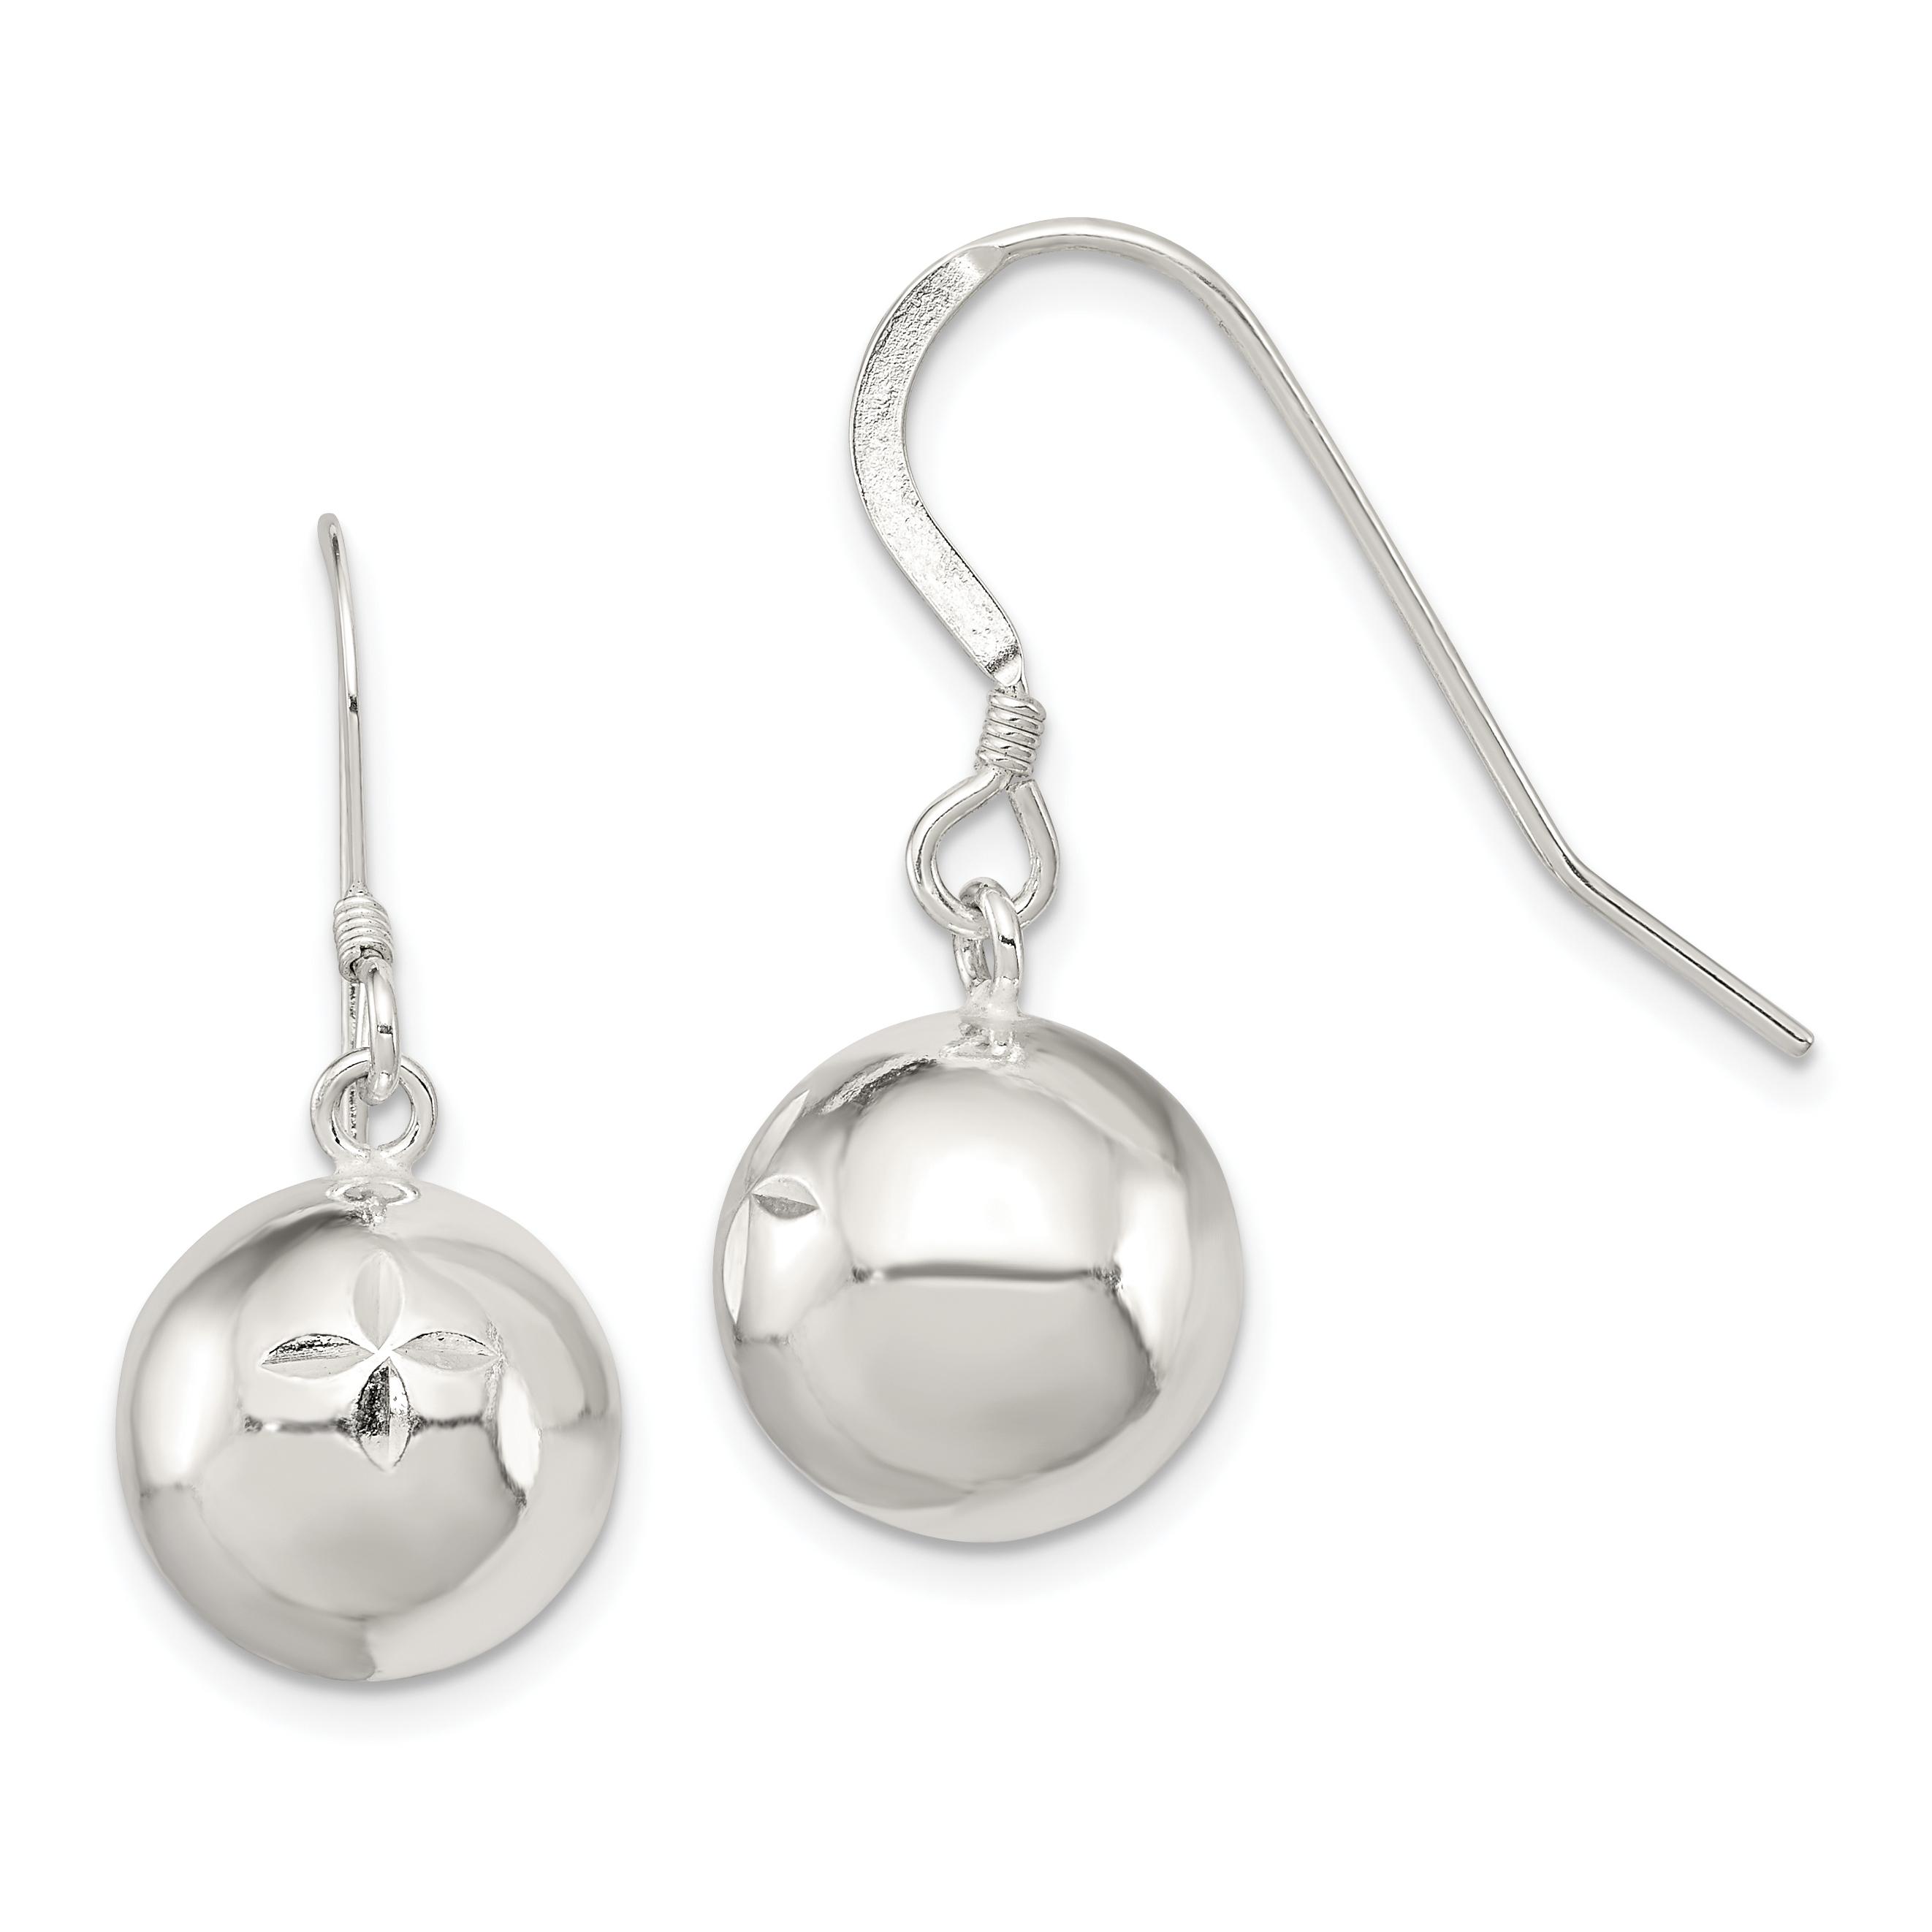 Sterling Silver Diamond Cut Dangle Ball Earrings Weight 4 94 Grams Length 27mm Width 12mm